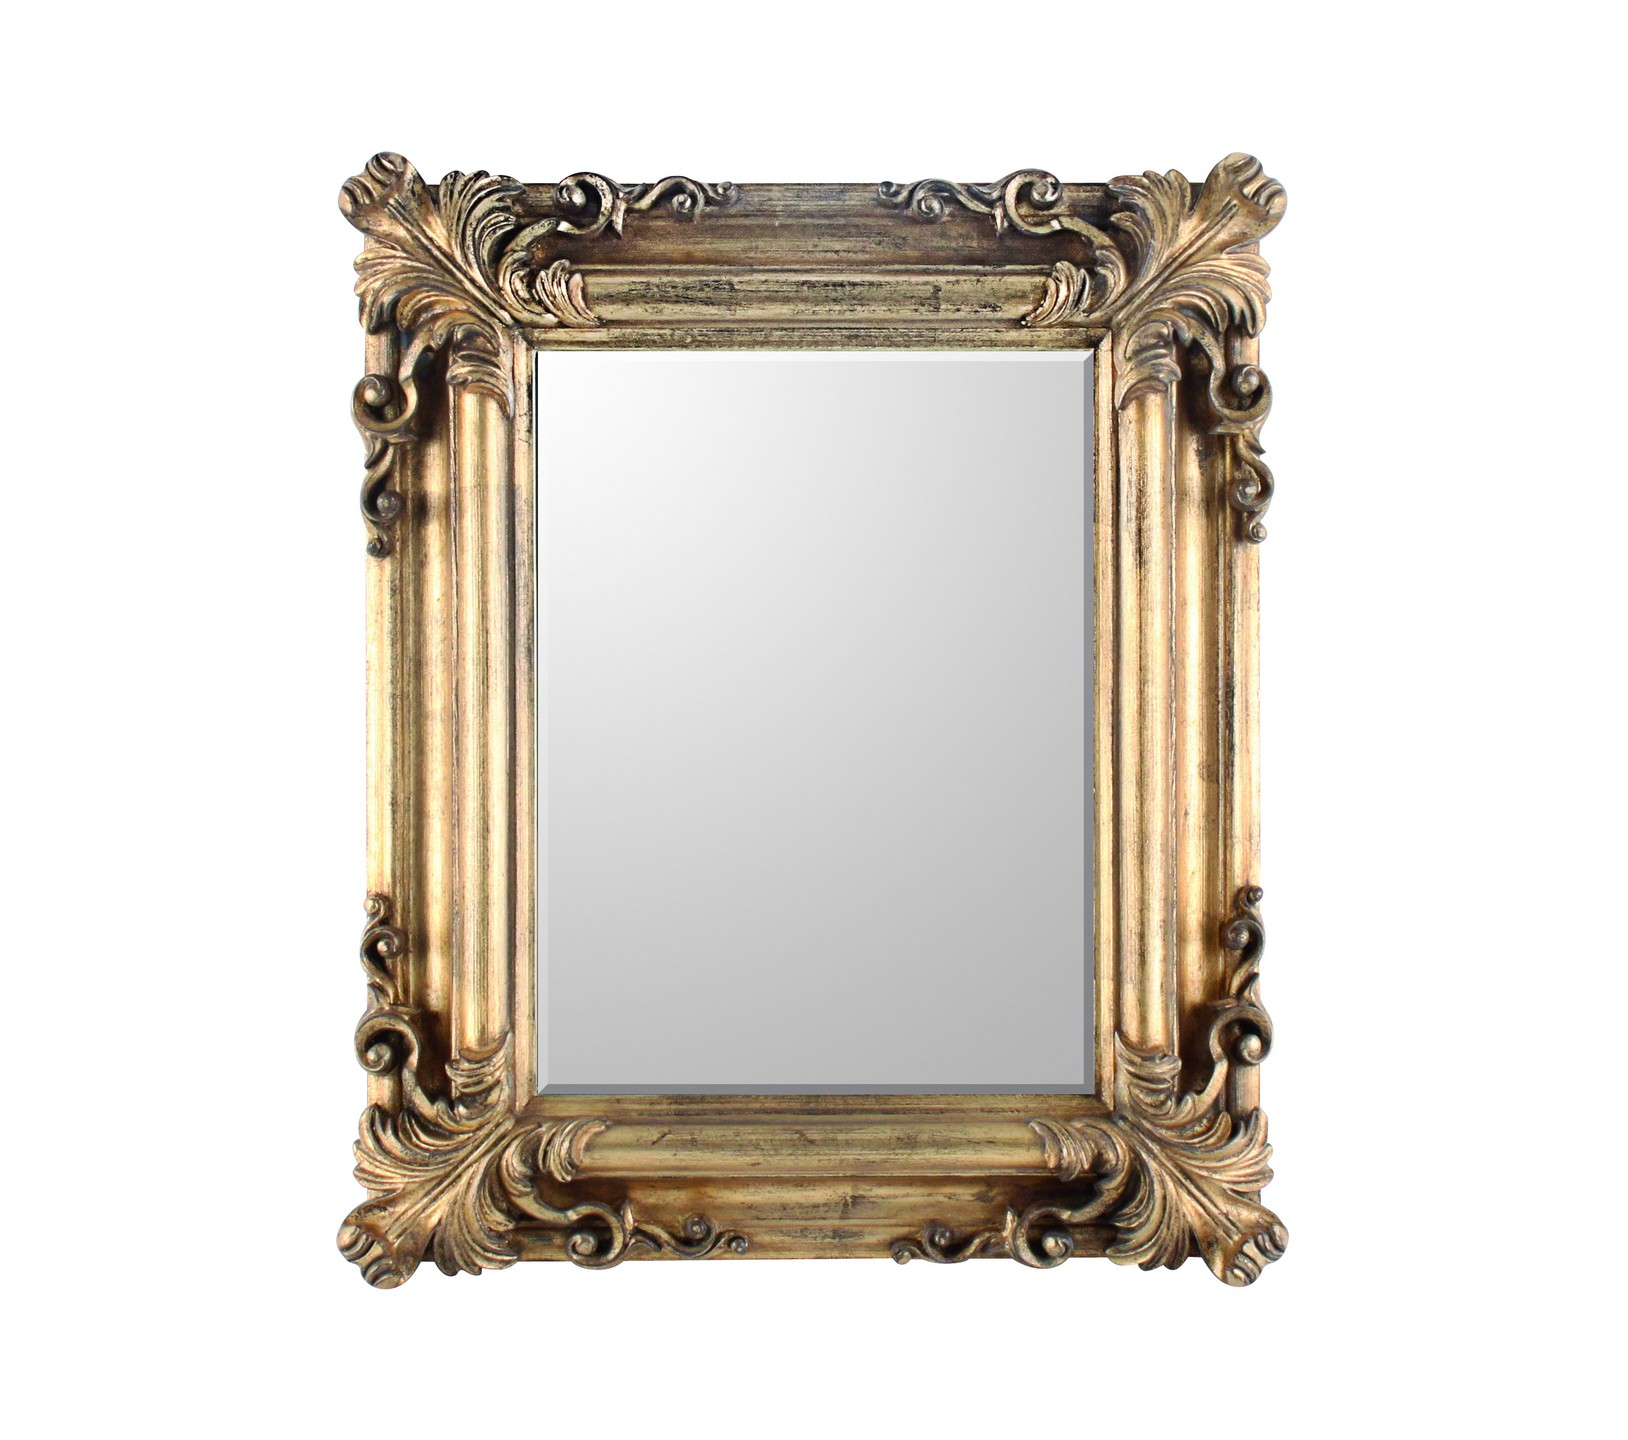 Зеркало Sweet SeaНастенные зеркала<br><br><br>Material: Полистоун<br>Ширина см: 48<br>Высота см: 59<br>Глубина см: 5